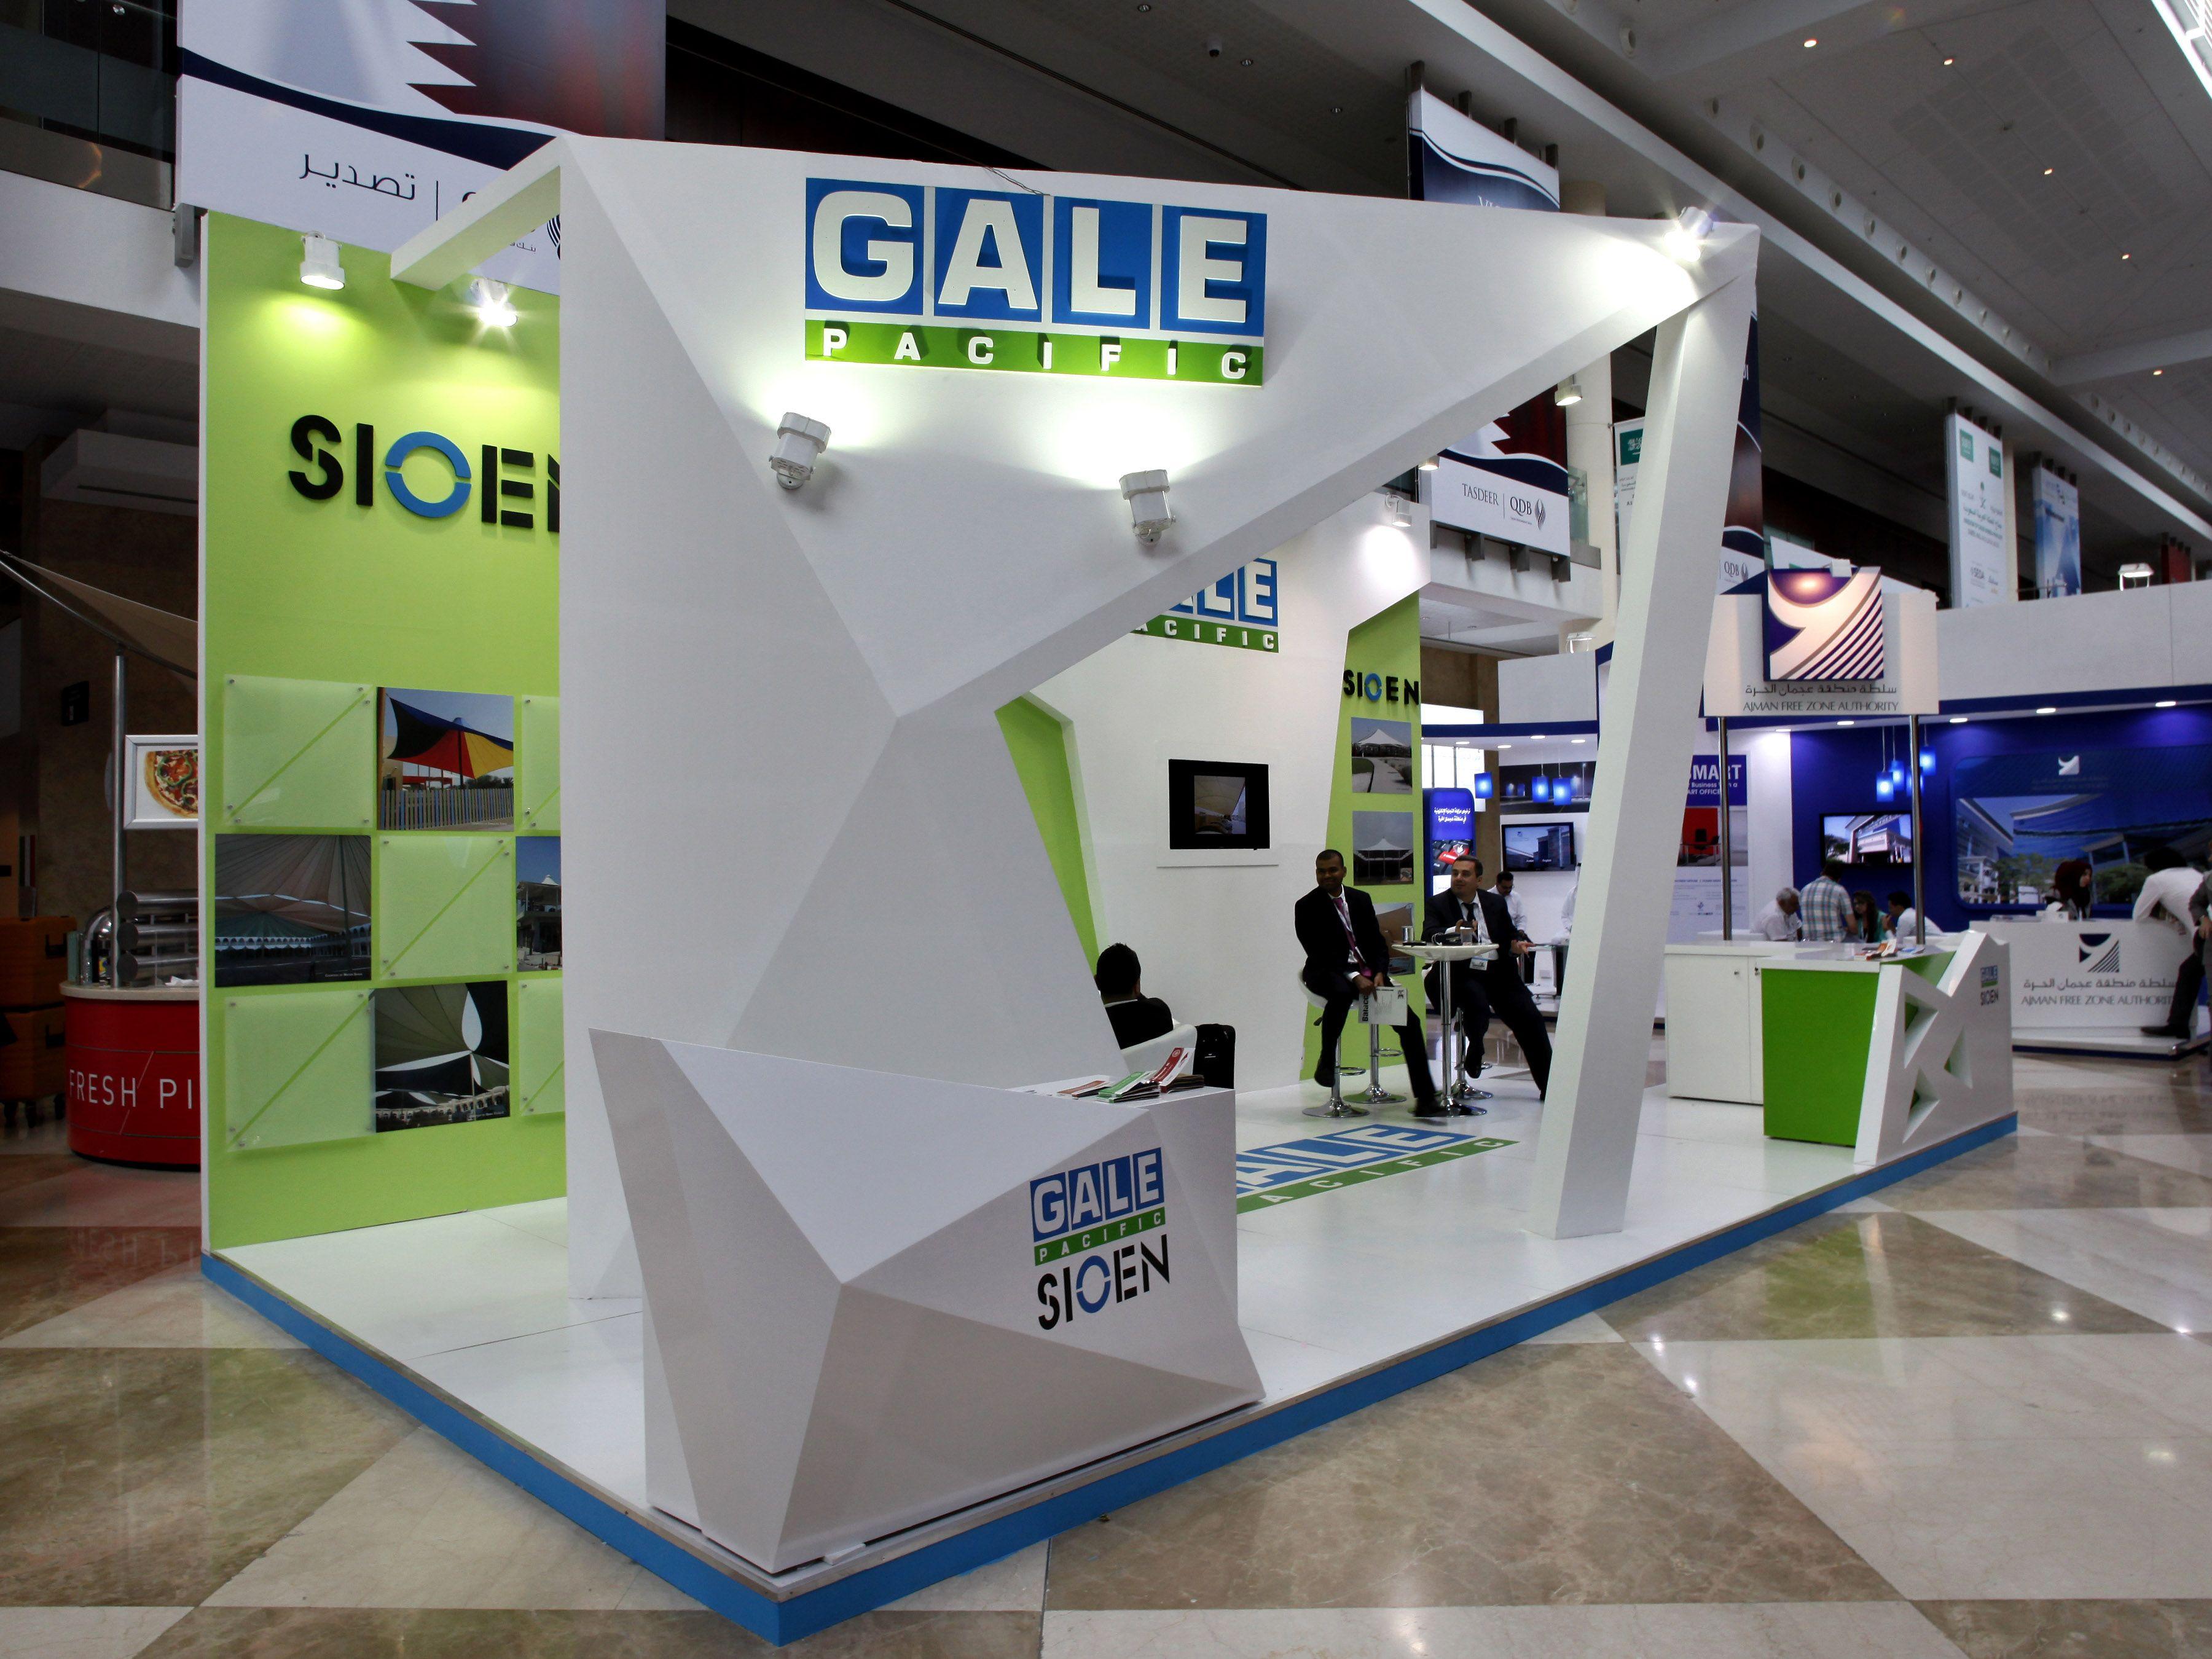 Exhibition Stand Design Nottingham : Gale pacific exhibition stand designed and produced by